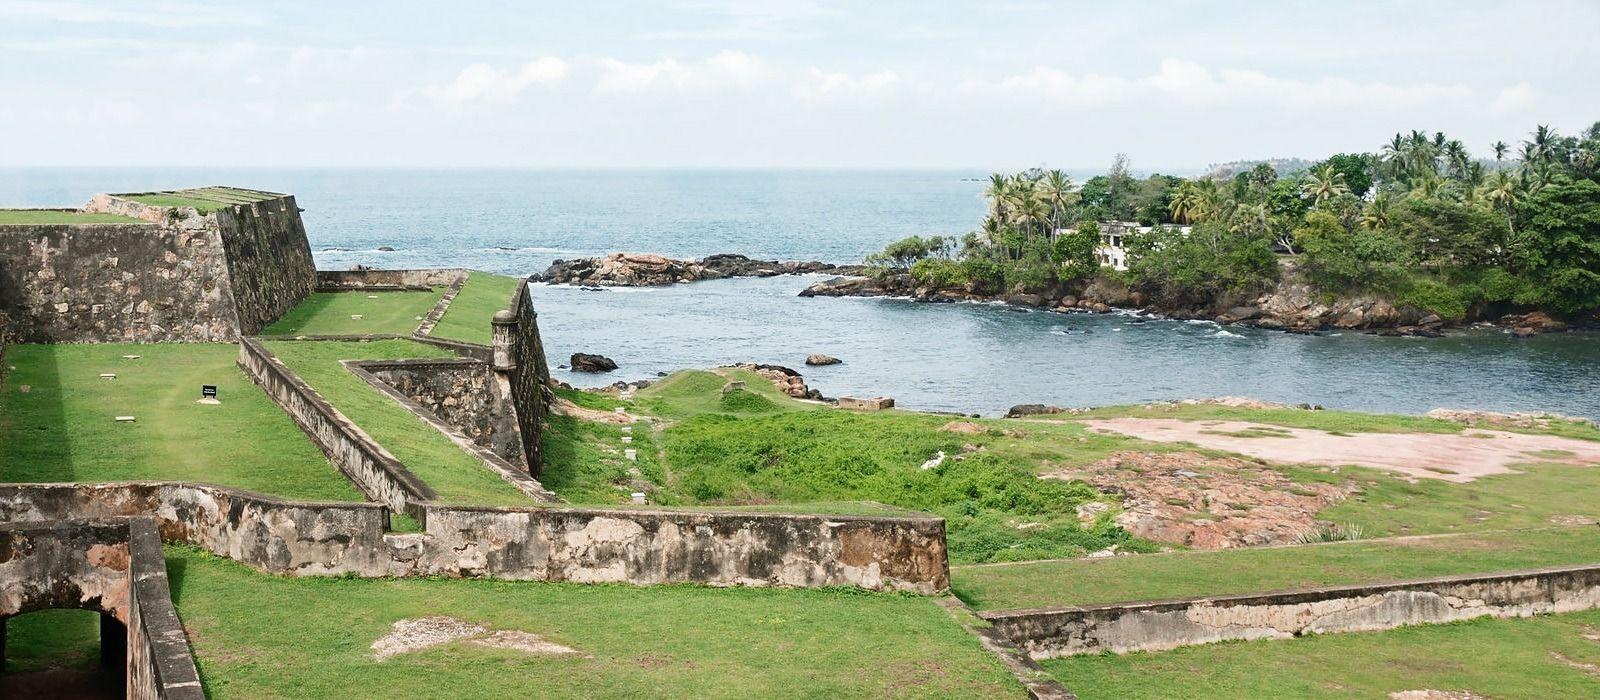 Destination Galle Fort Sri Lanka